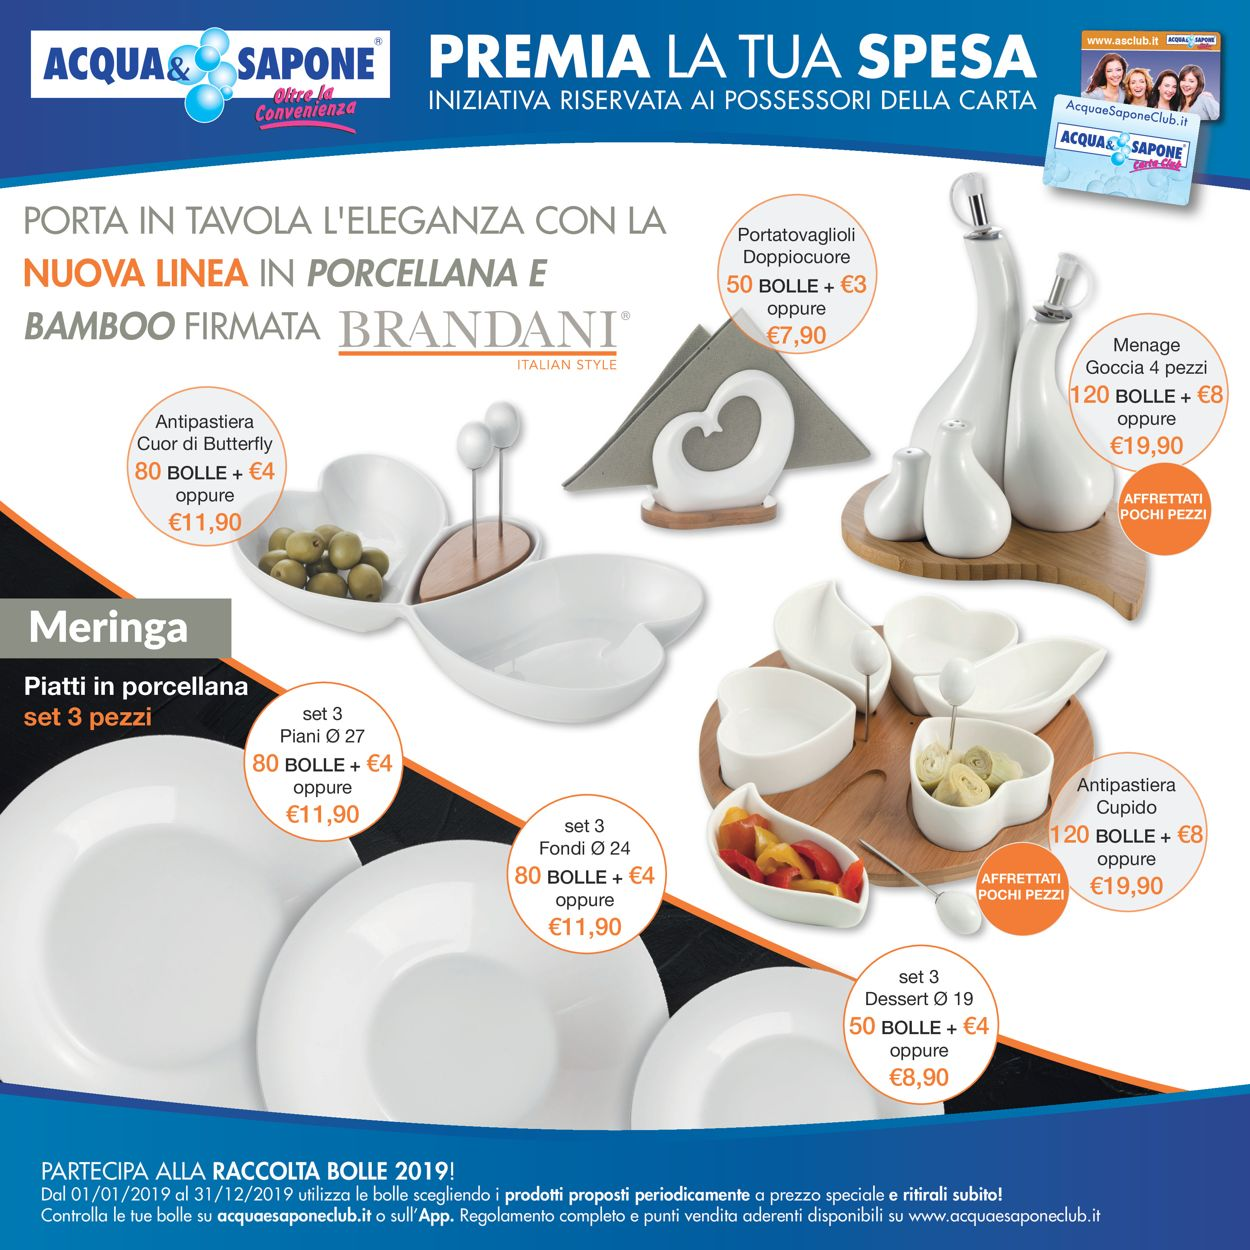 Volantino Acqua & Sapone - Offerte 07/05-26/05/2019